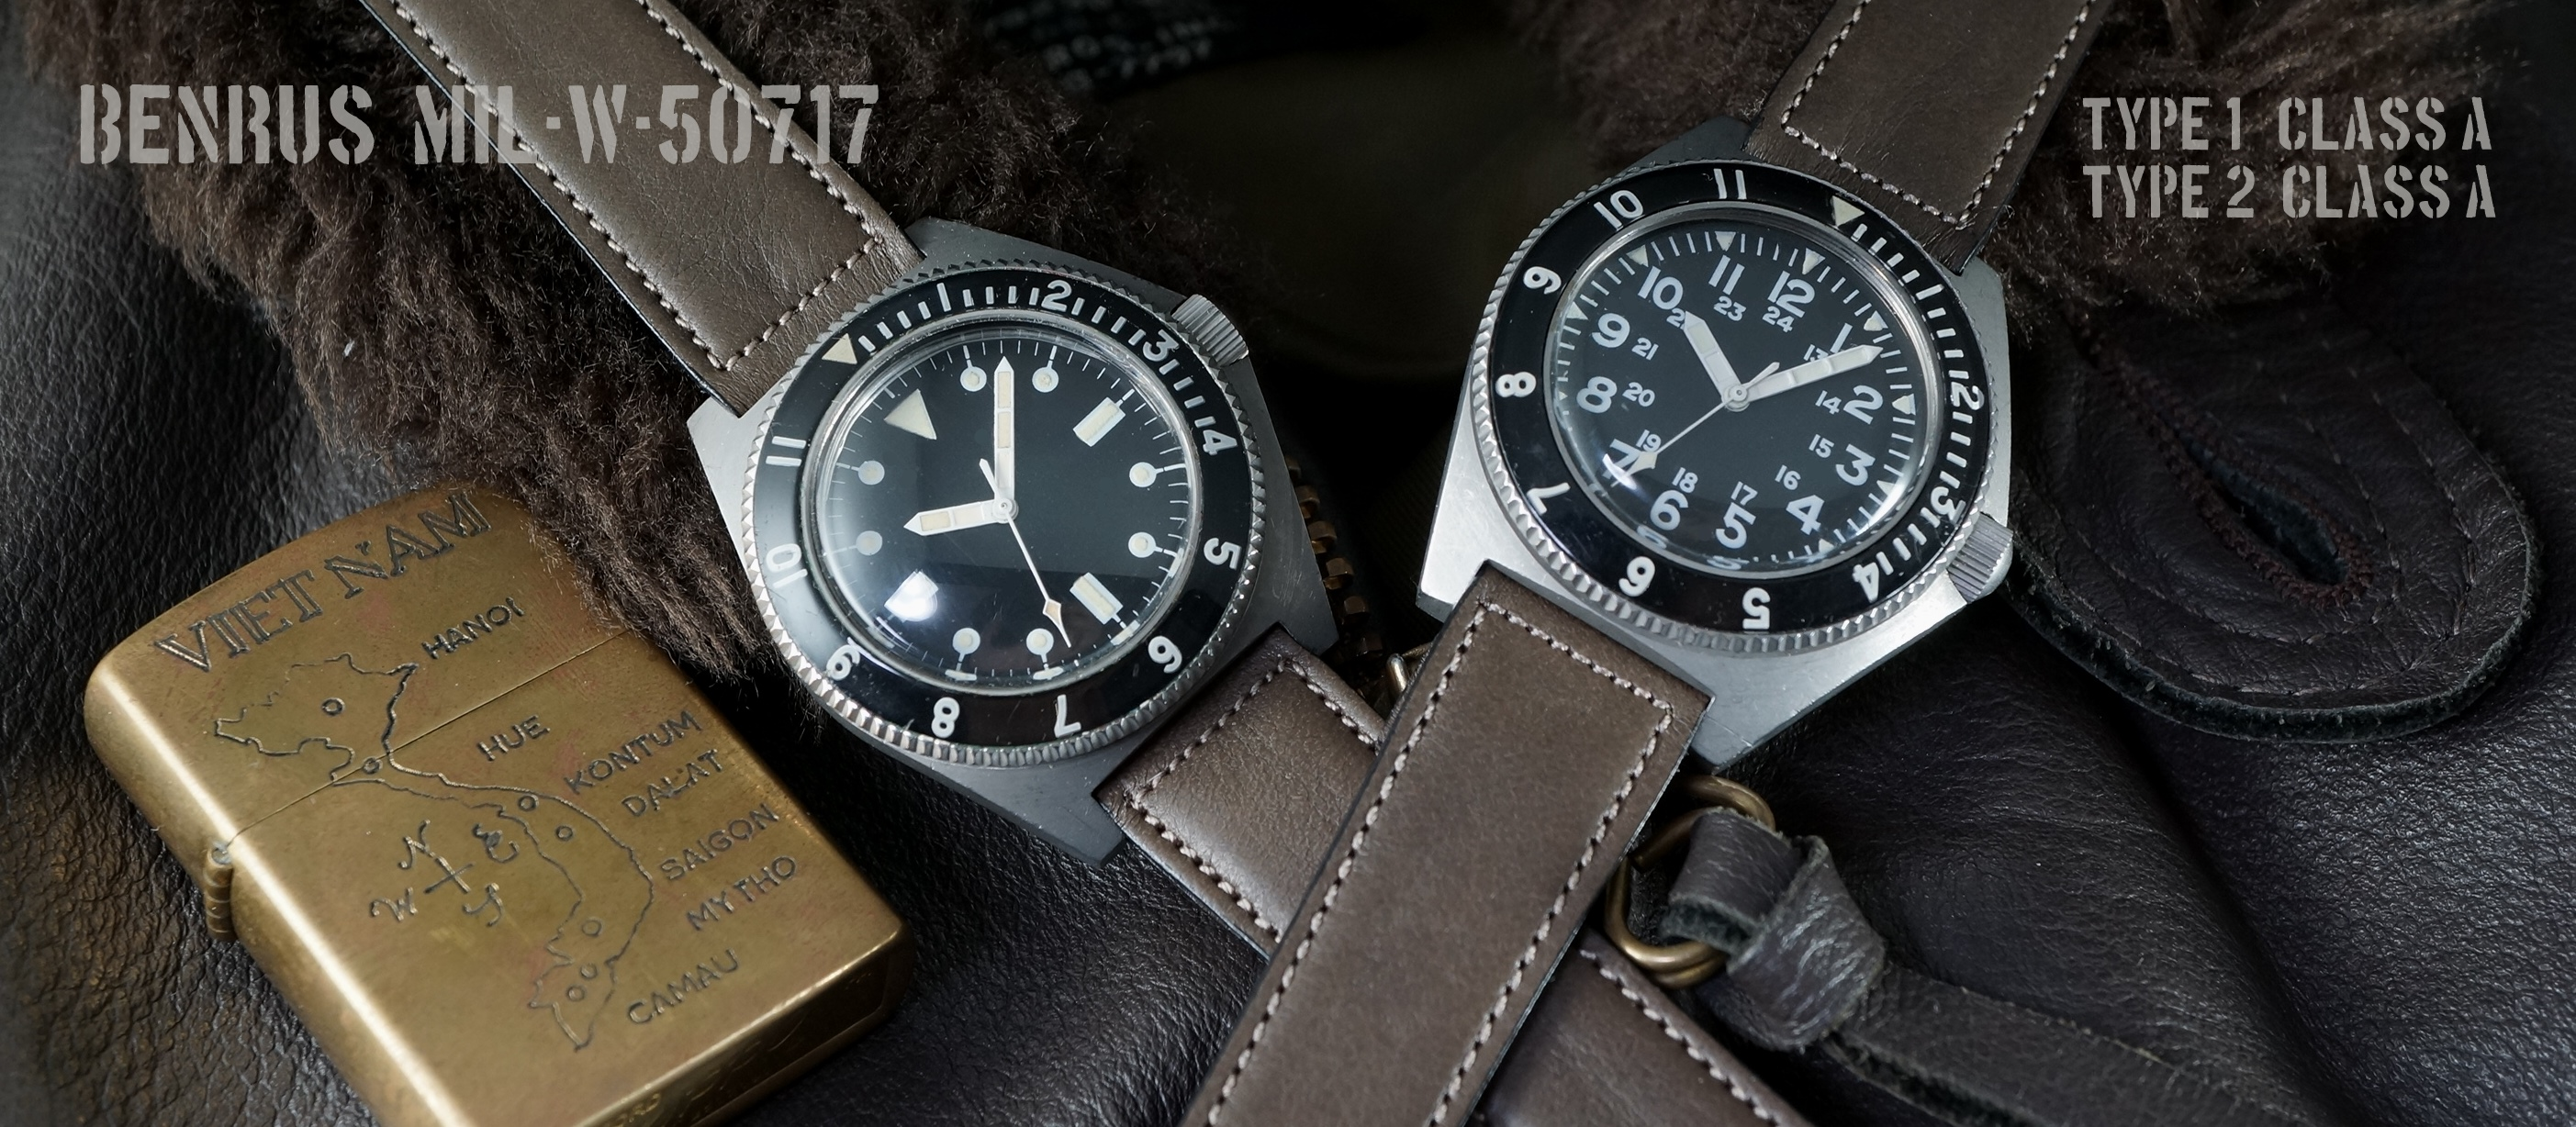 17HP-image-military21